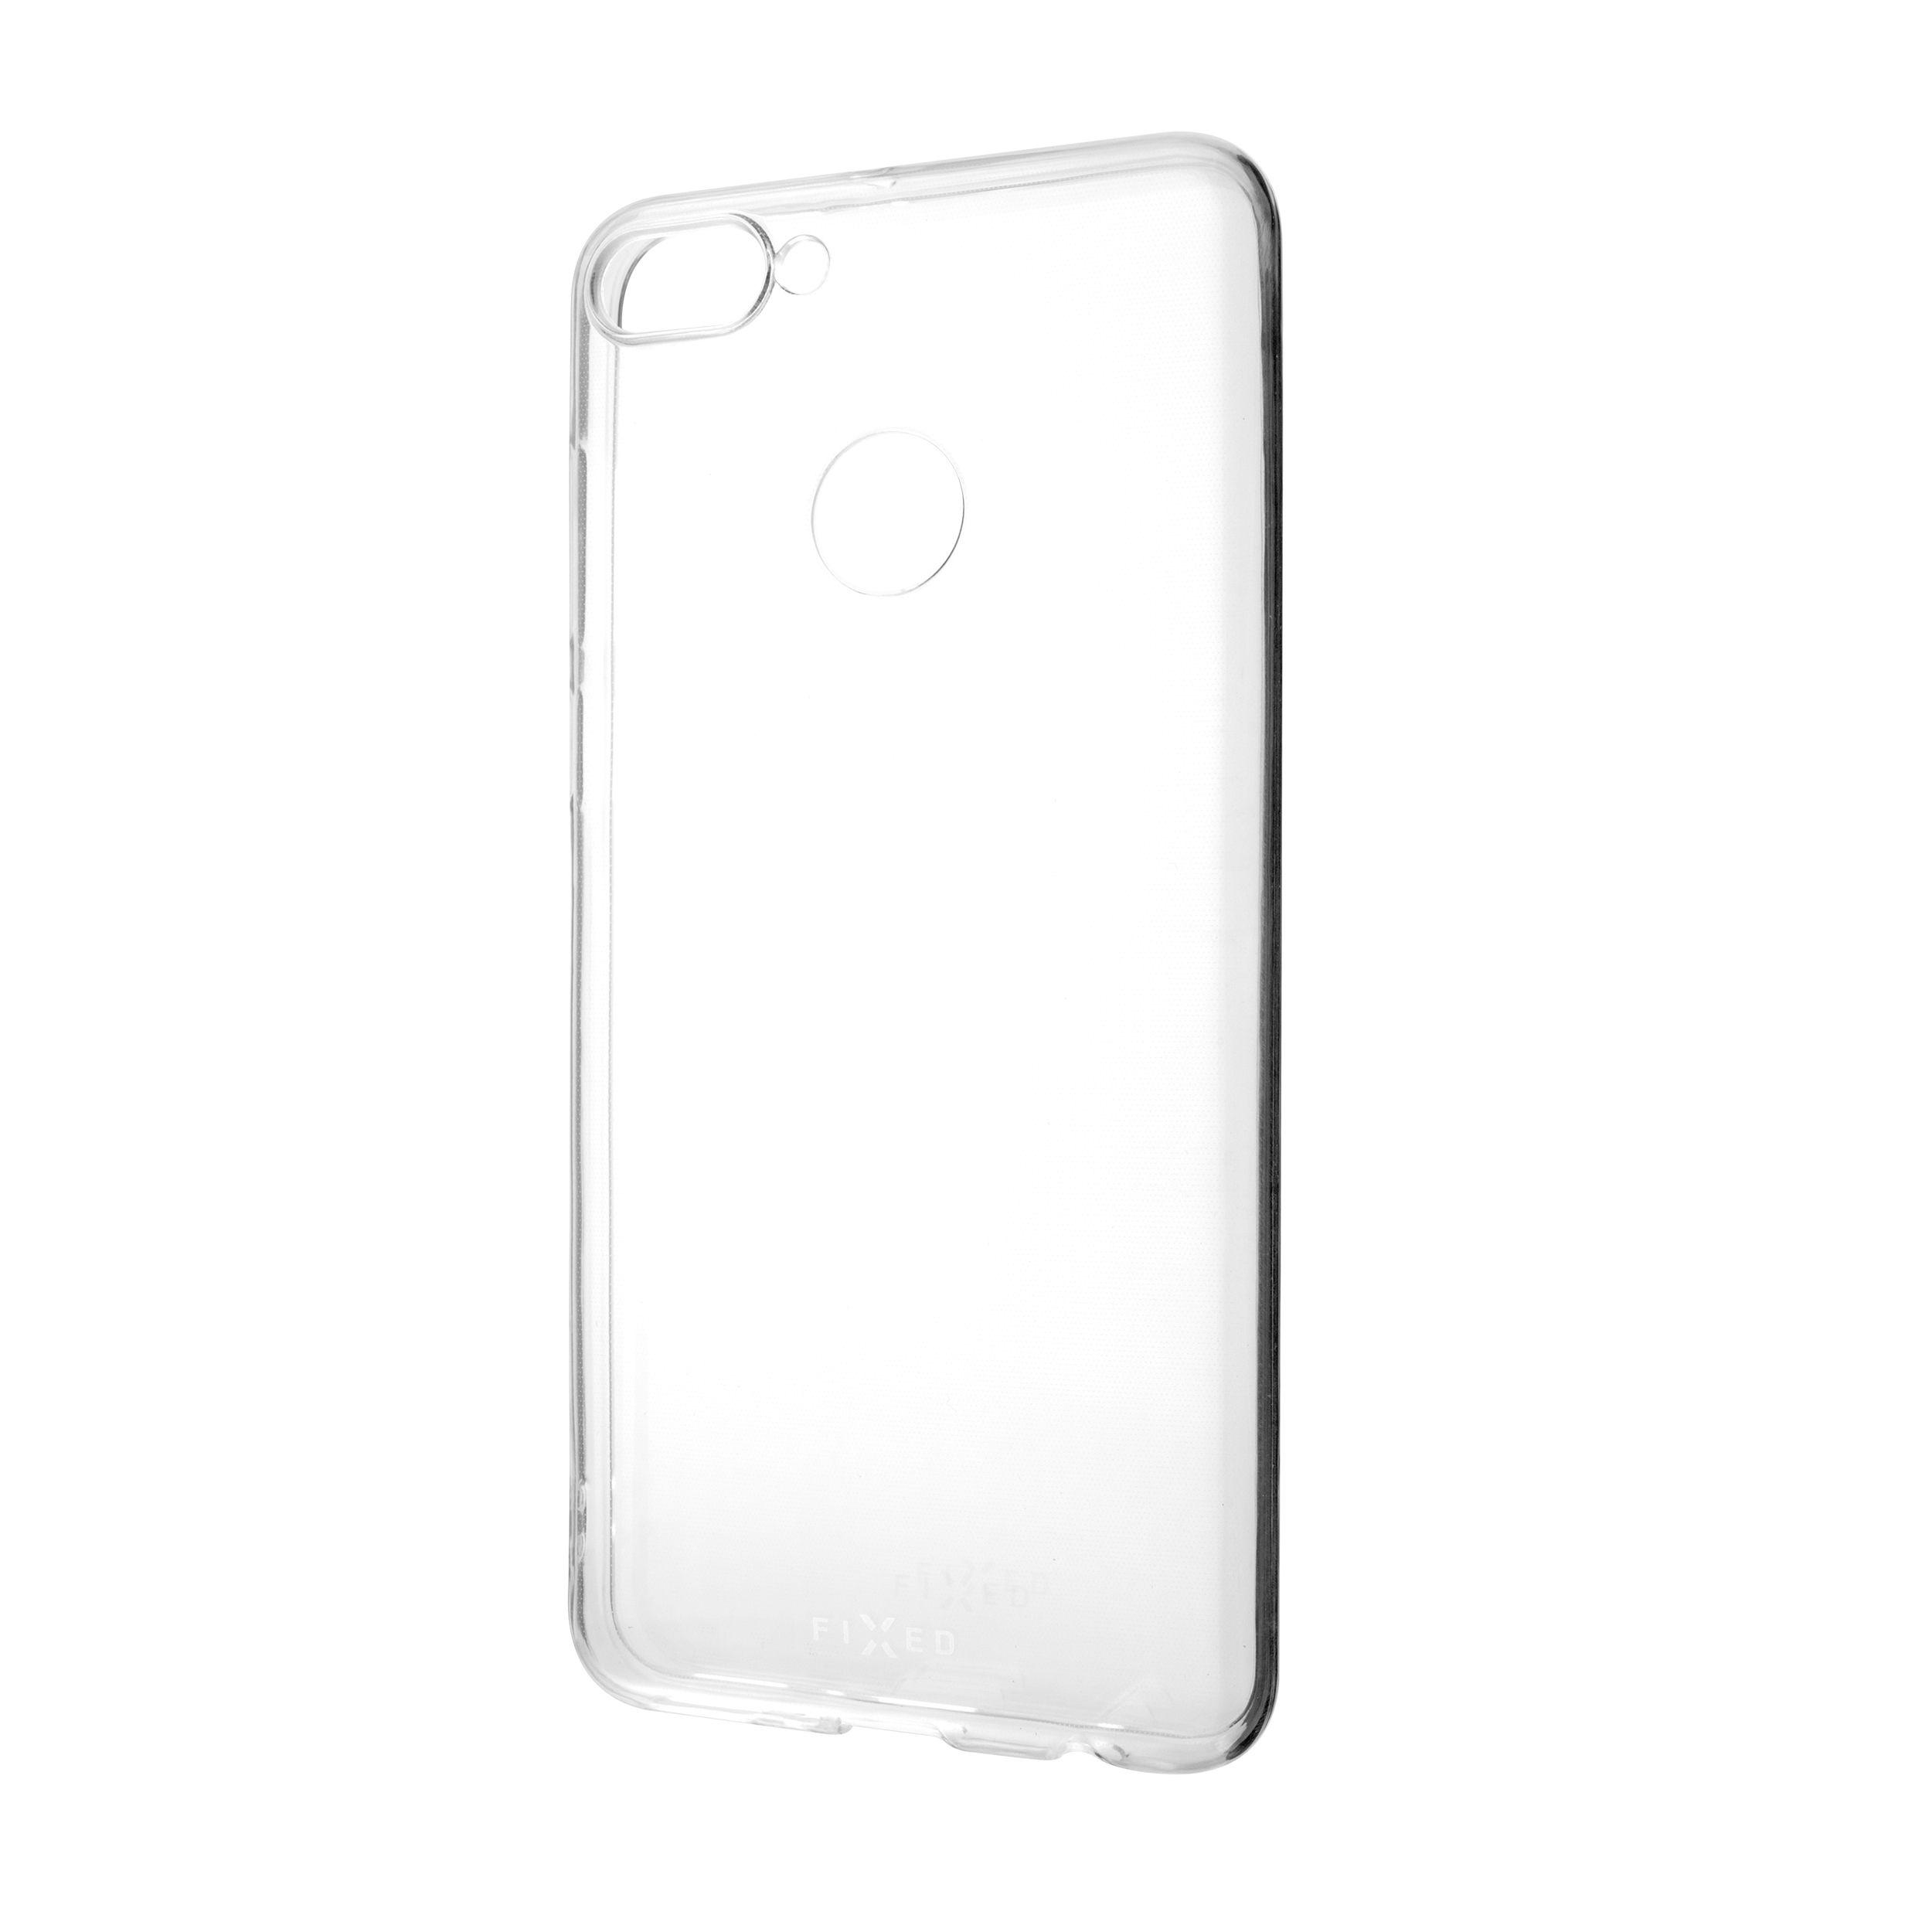 Ultratenké TPU gelové pouzdro FIXED Skin pro Huawei Y9 (2018), 0,6 mm, čiré